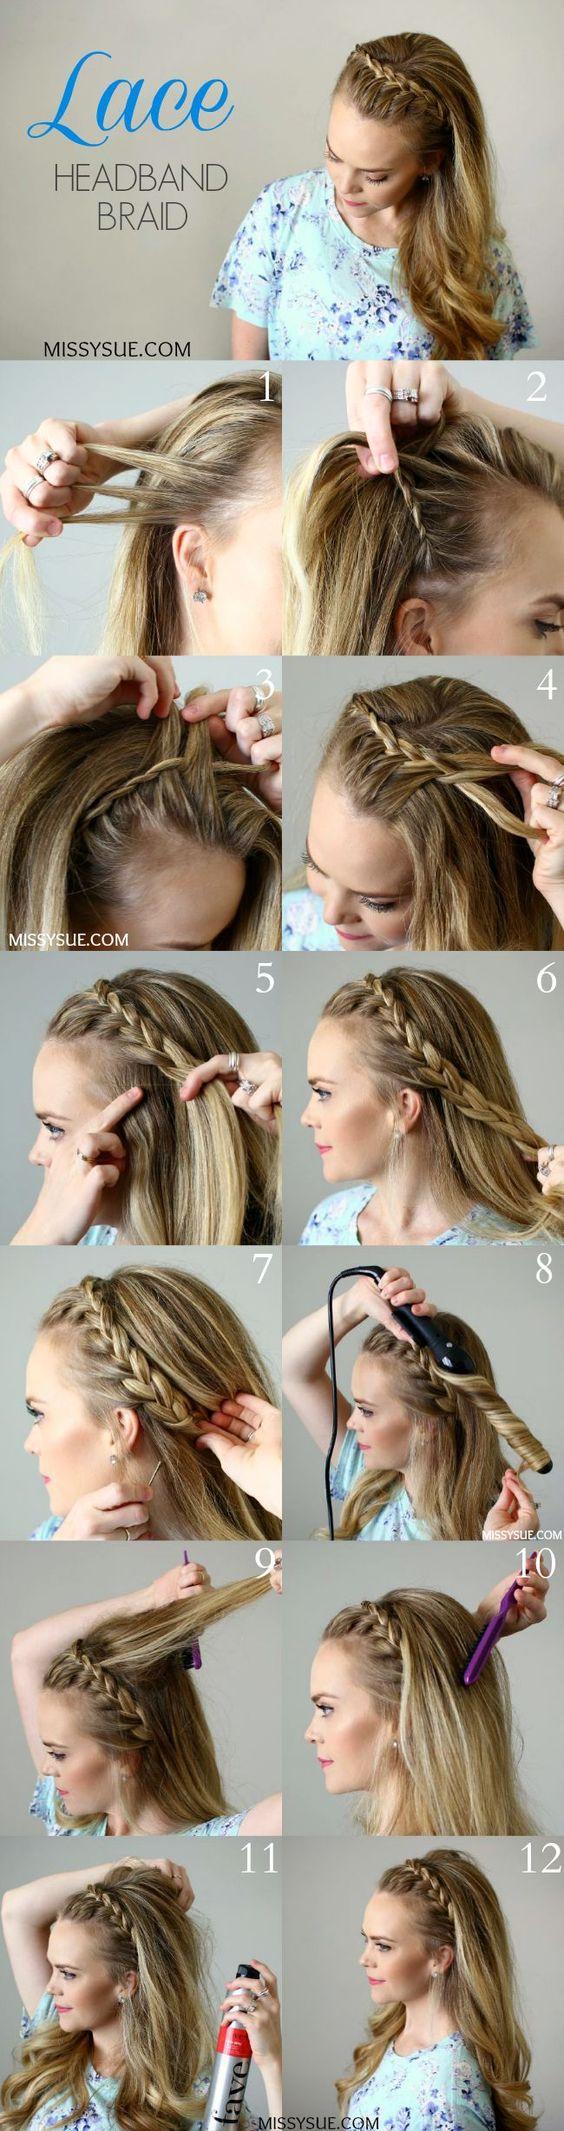 Tutorial peinado trenza diadema